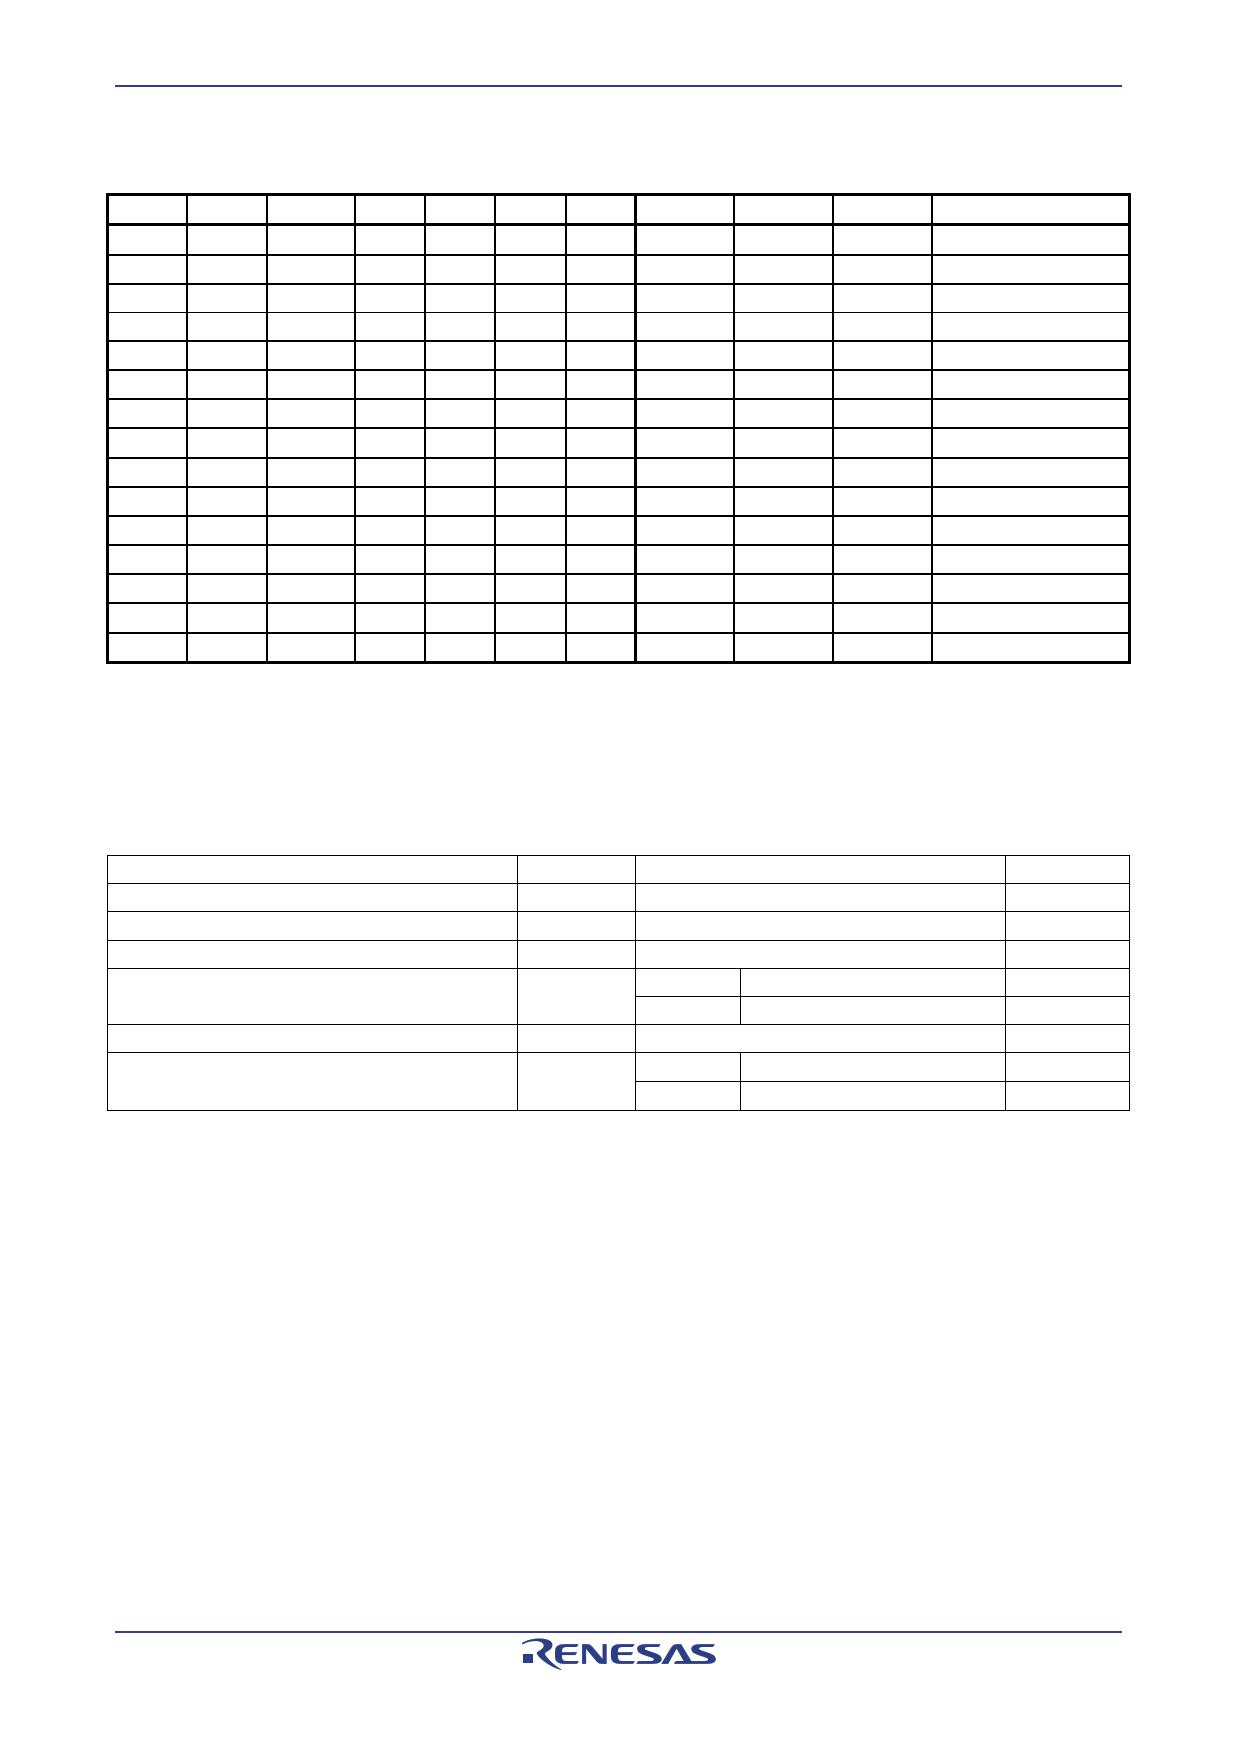 R1LV3216RSA-7S pdf